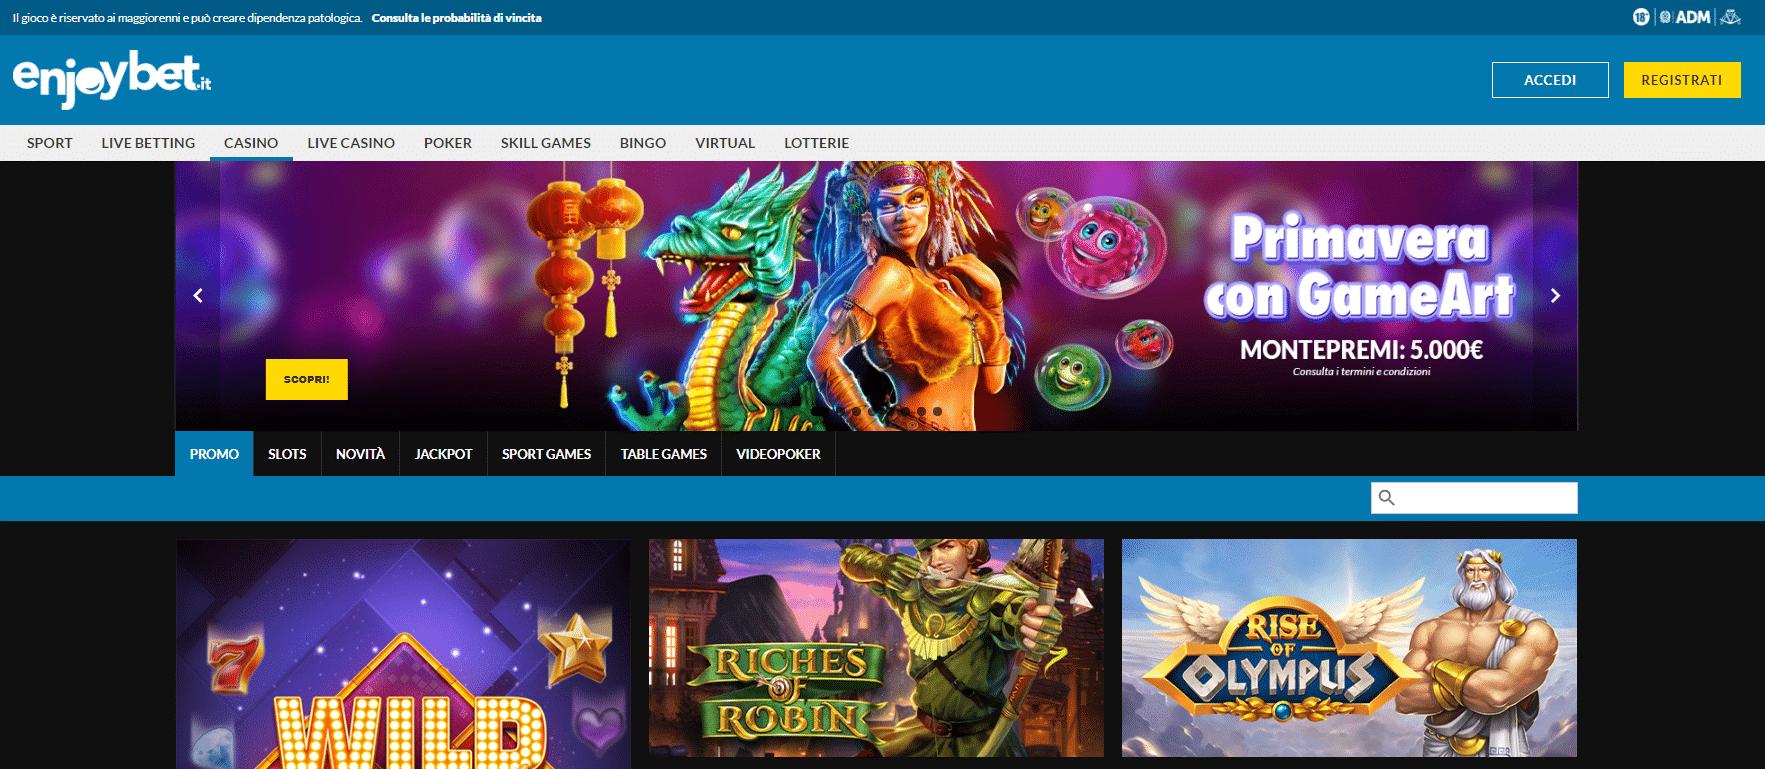 Enjoybet Homepage